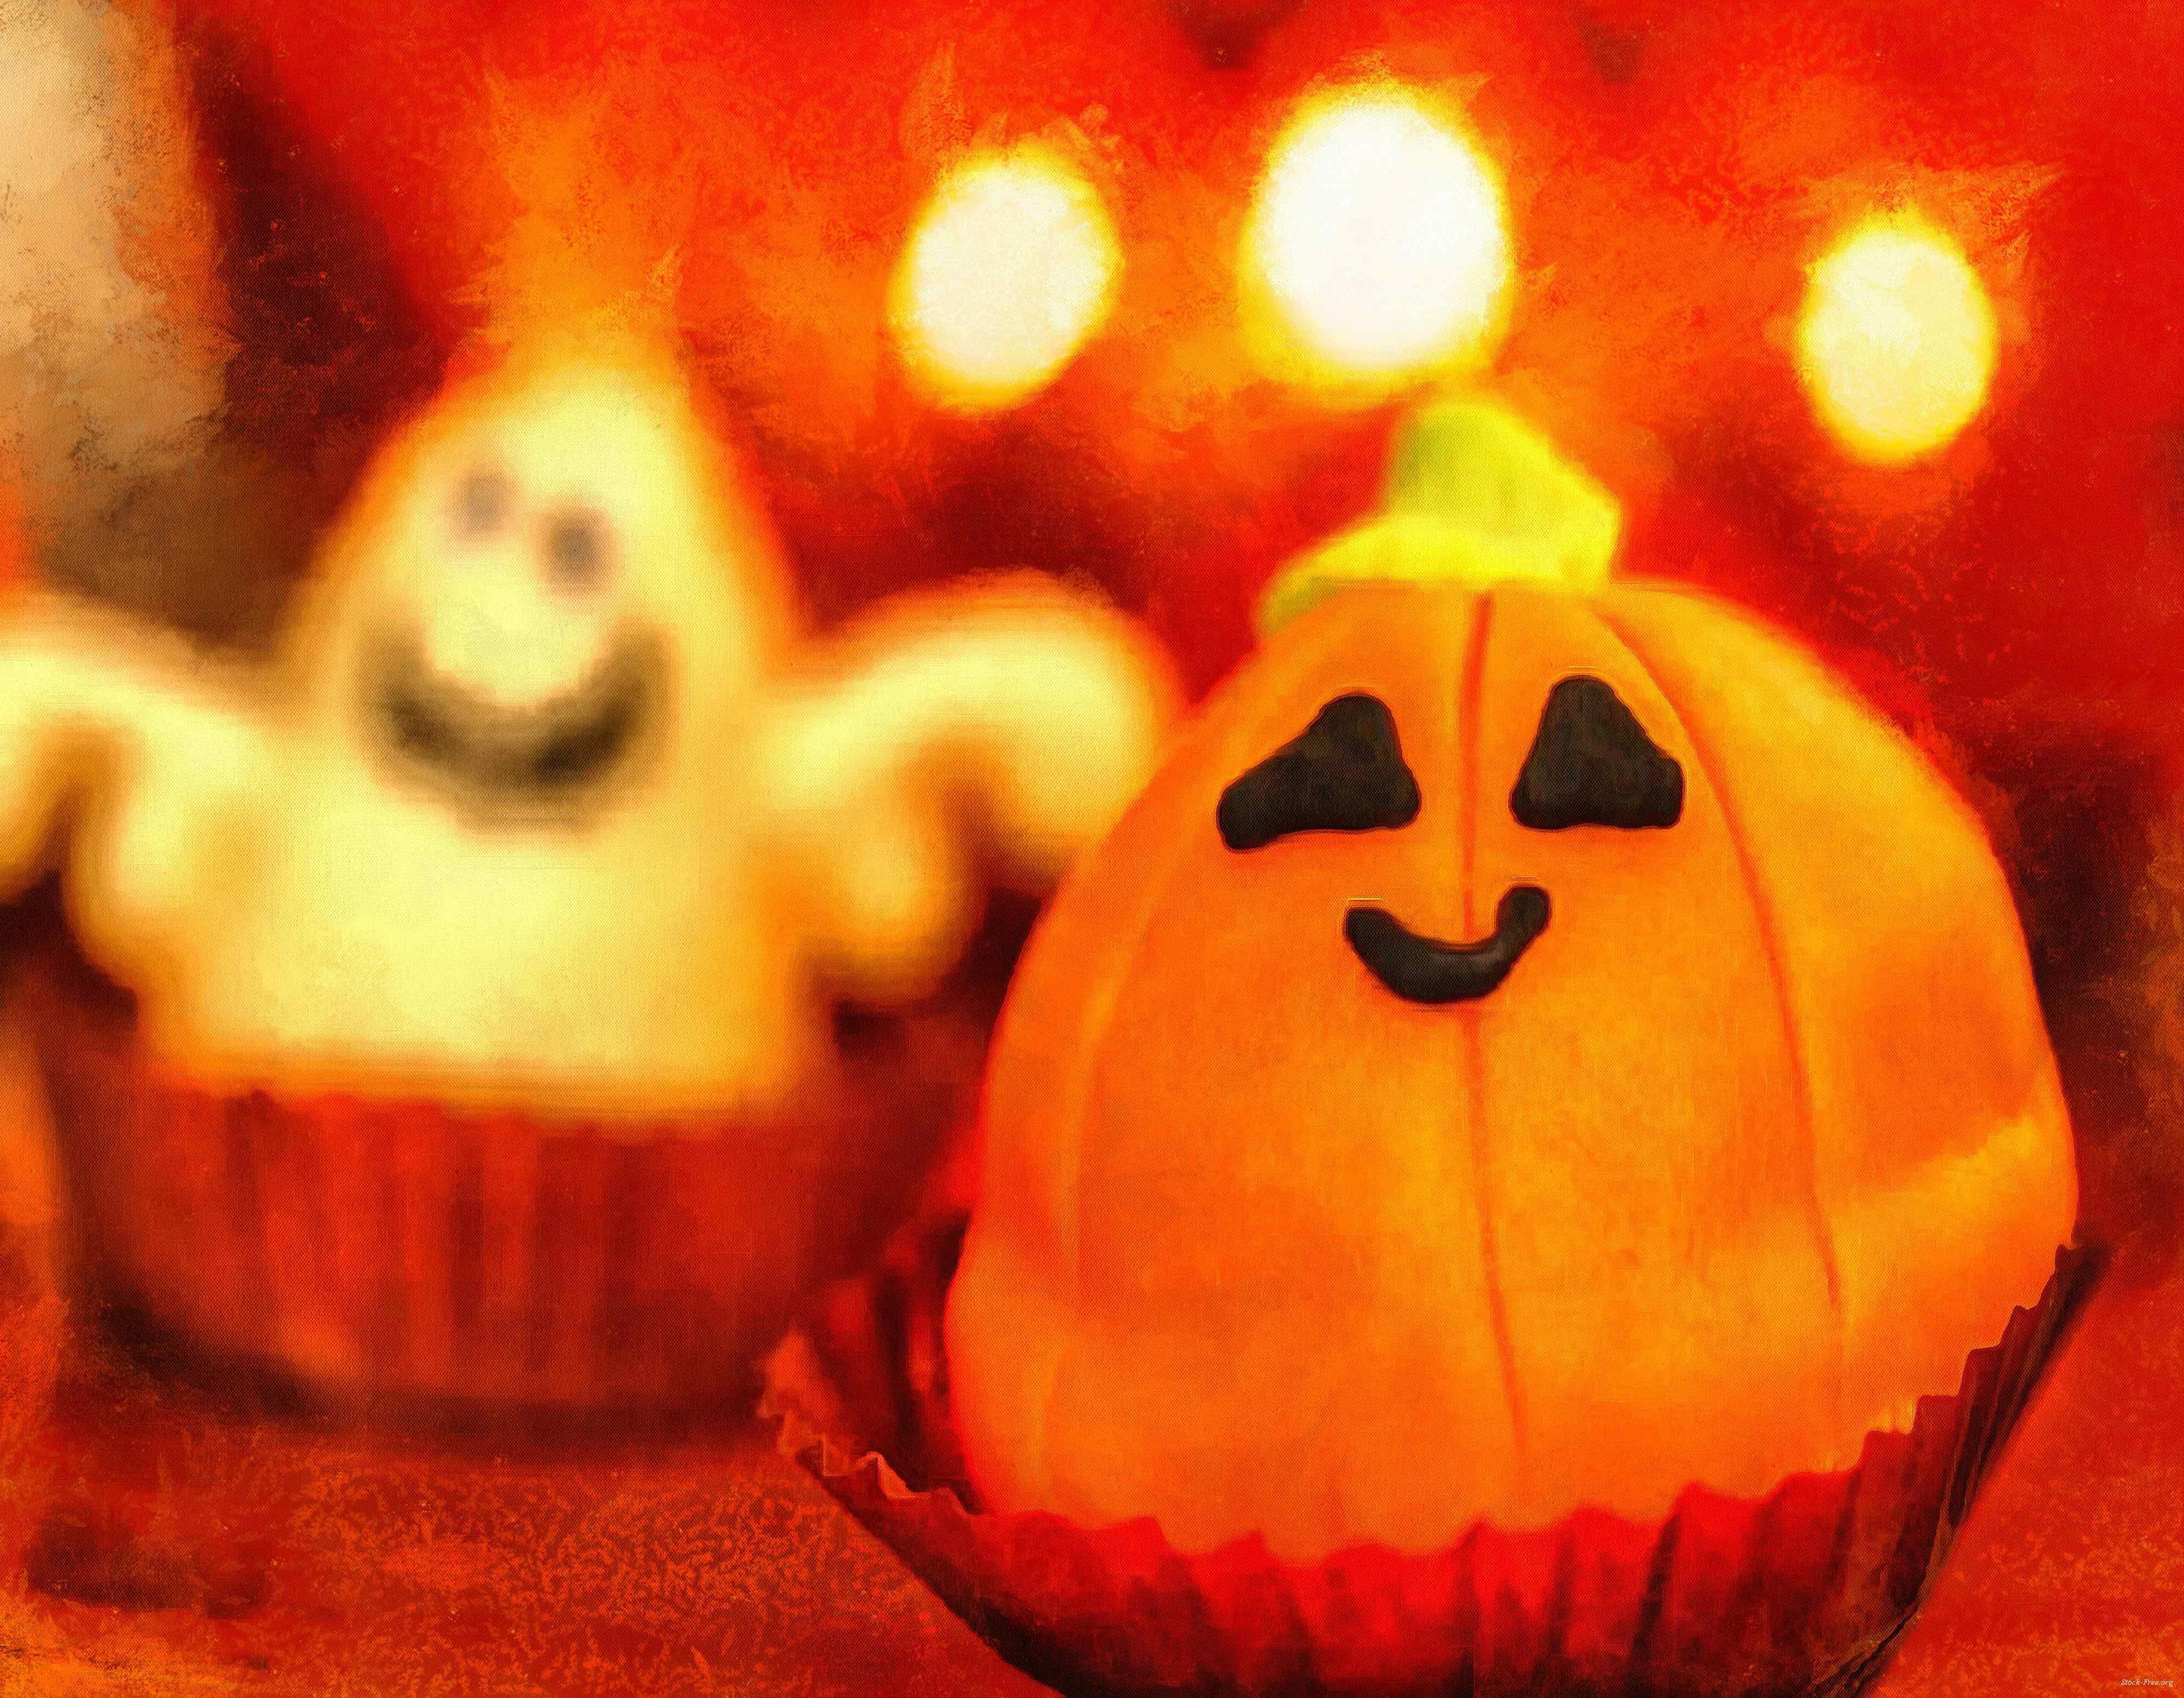 https://www.stock-free.org/images/Halloween-Stock-Free-Image-18052015-image-442.jpg